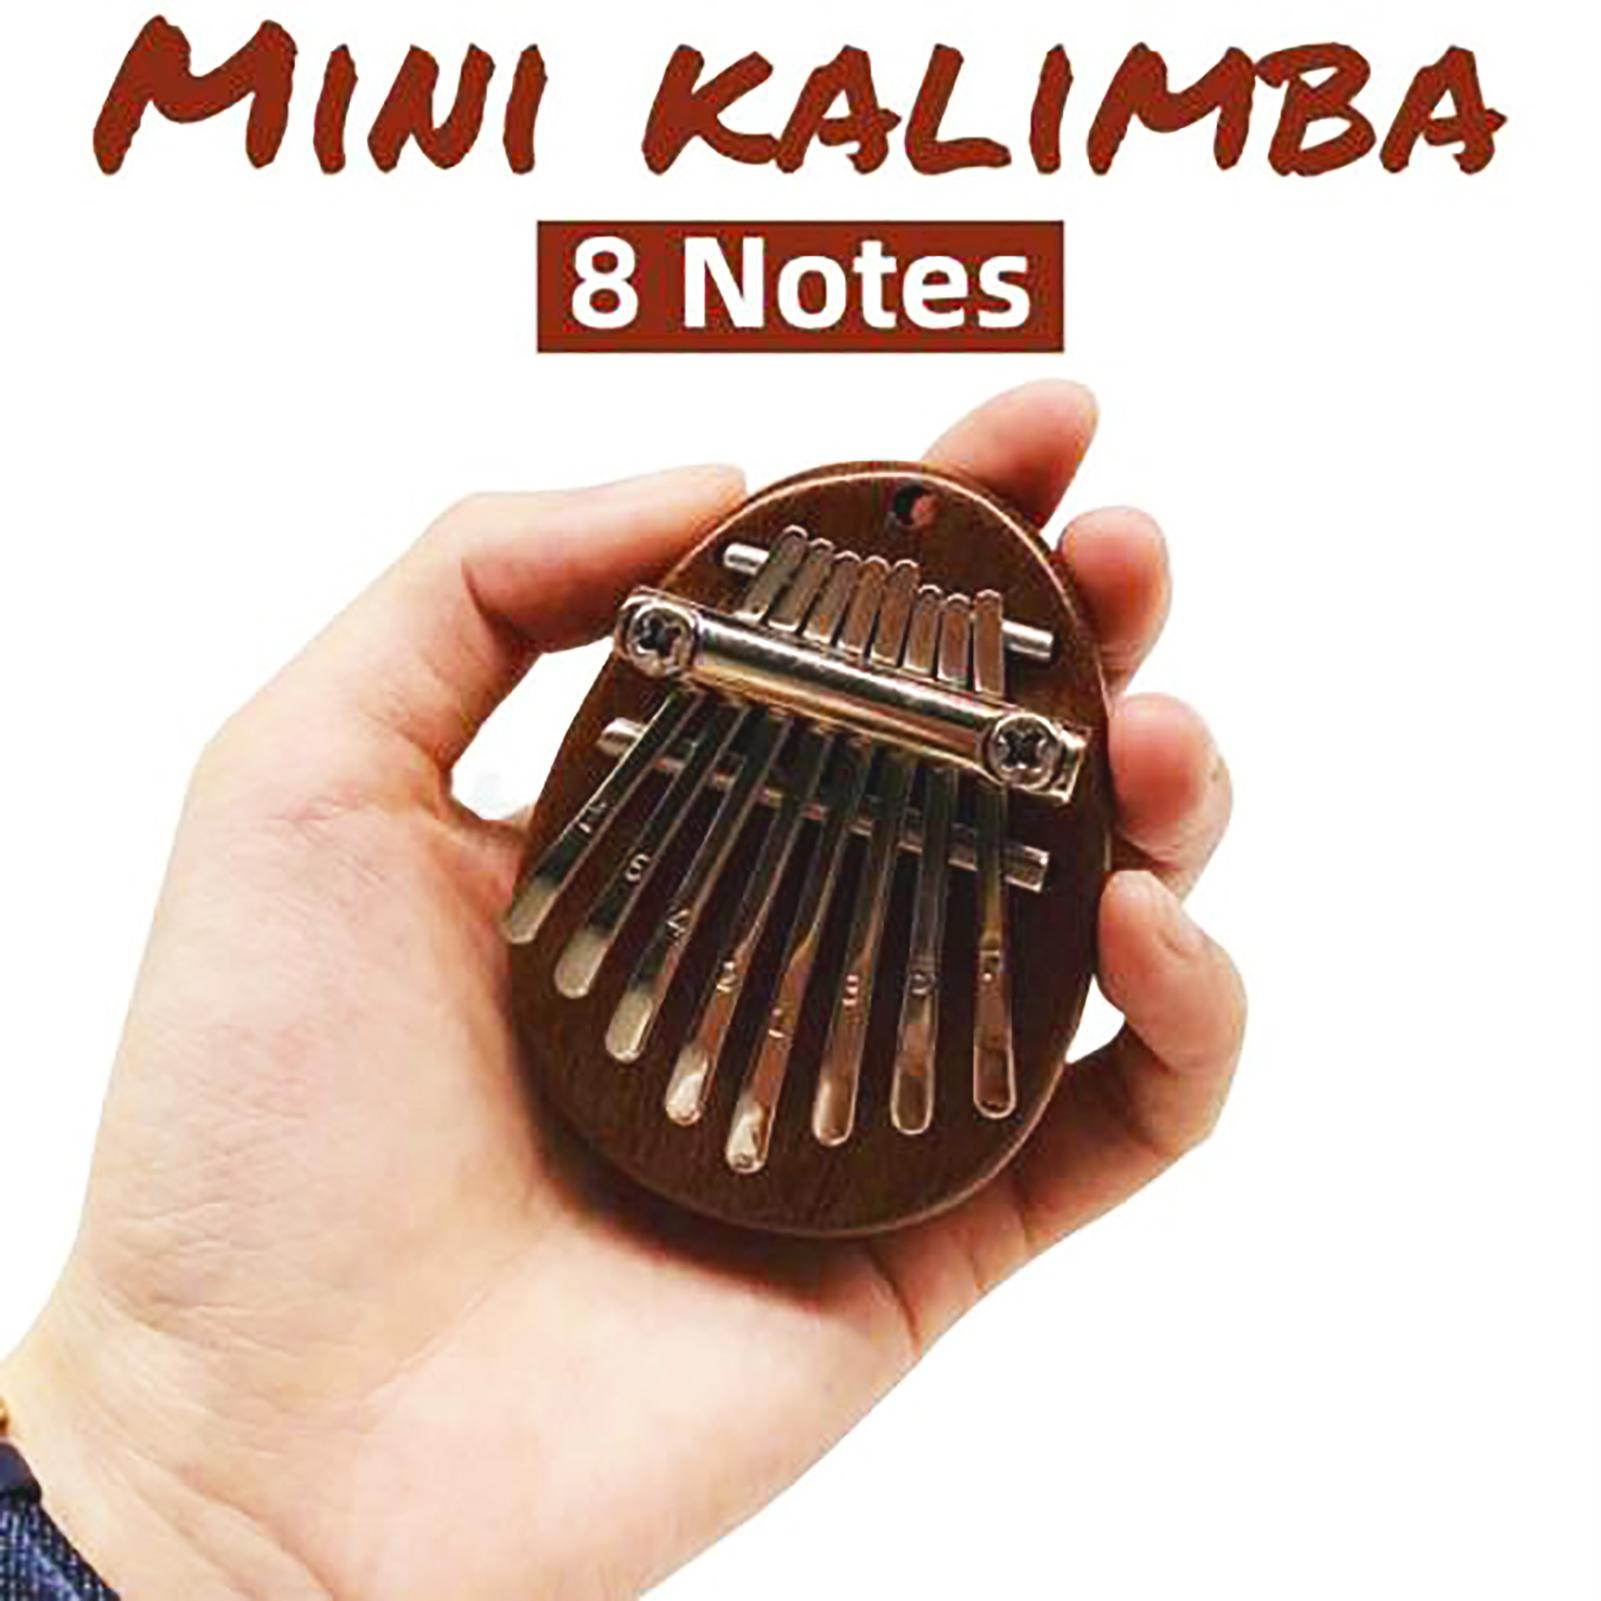 8 Keys Thumb Piano Mini Kalimba Wood Mahogany Mbira Body Musical Instruments Kalimba Piano Music Box